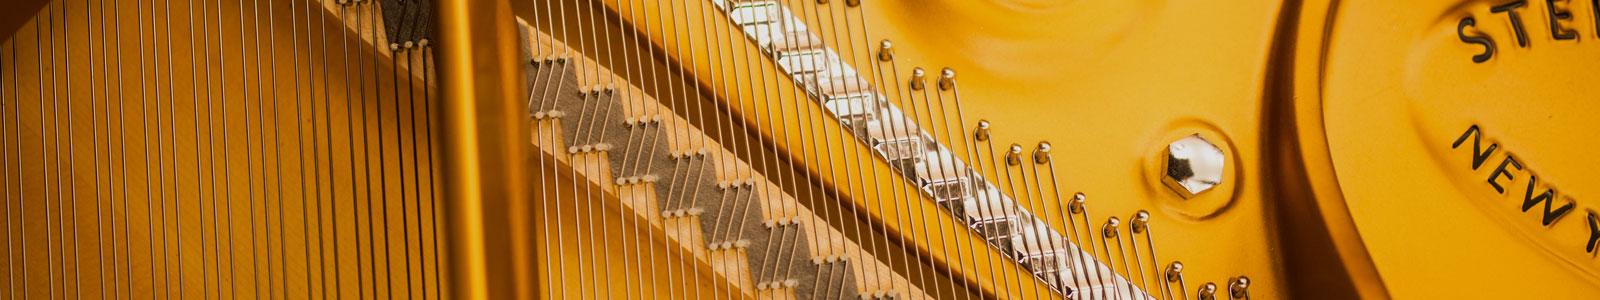 Musikkonservatoriet Falun - KU Klassisk Musik